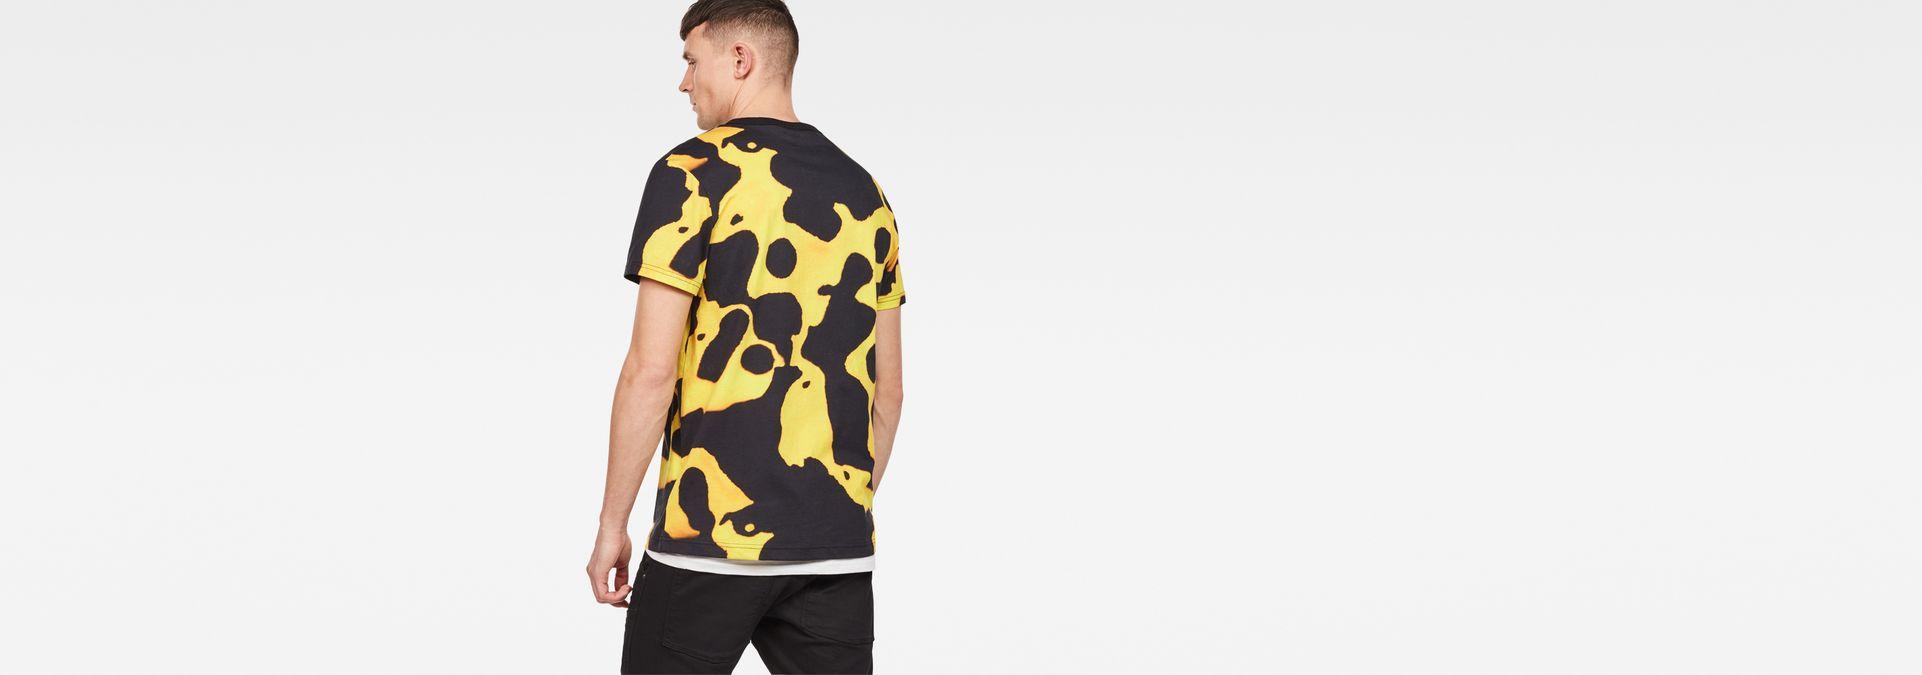 b1ac293a4 ... G-Star RAW® Fian Bumble Frog Patterned T-Shirt Yellow model back ...